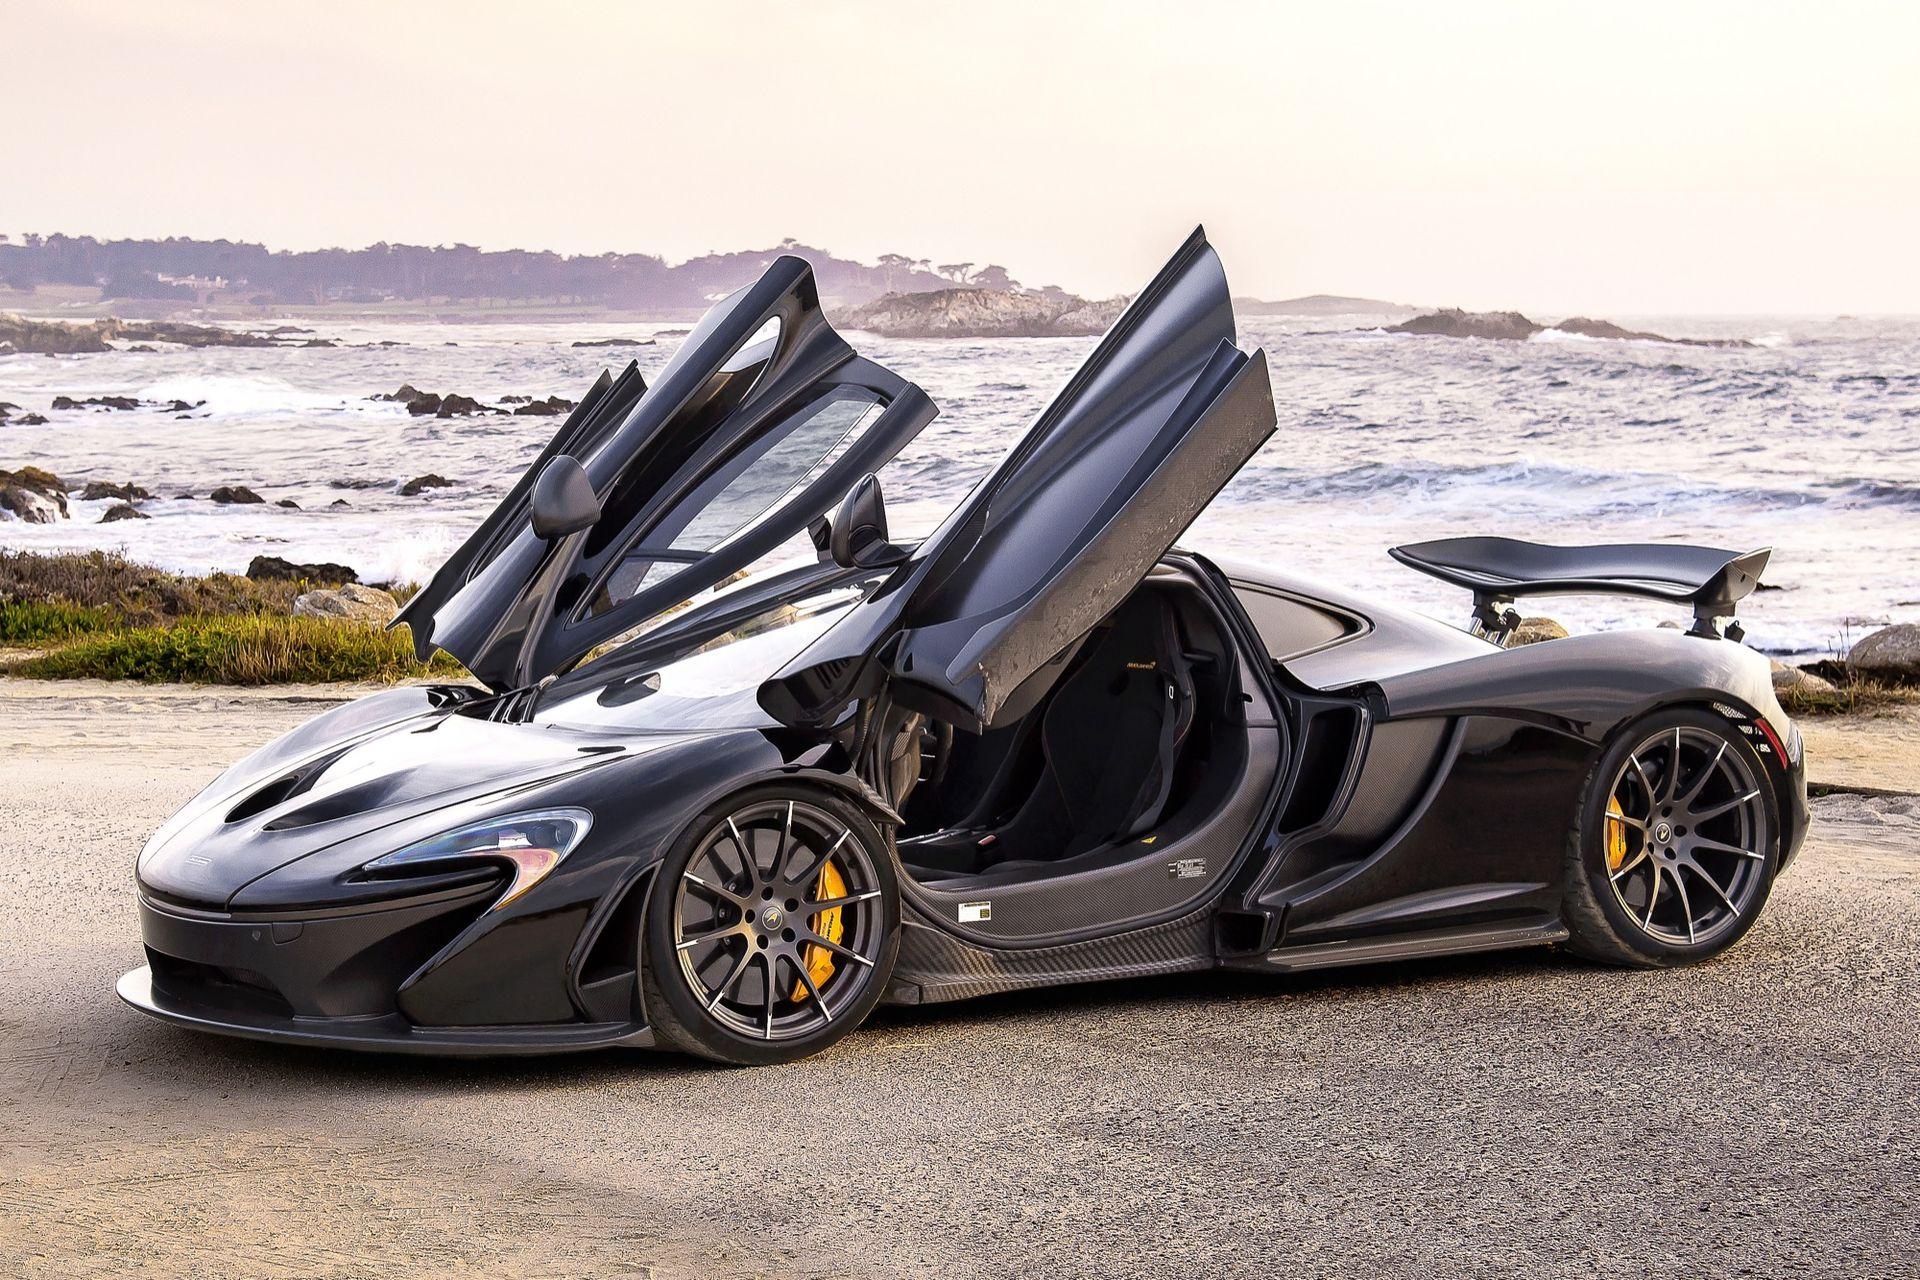 McLaren får lån på 150 miljoner pund